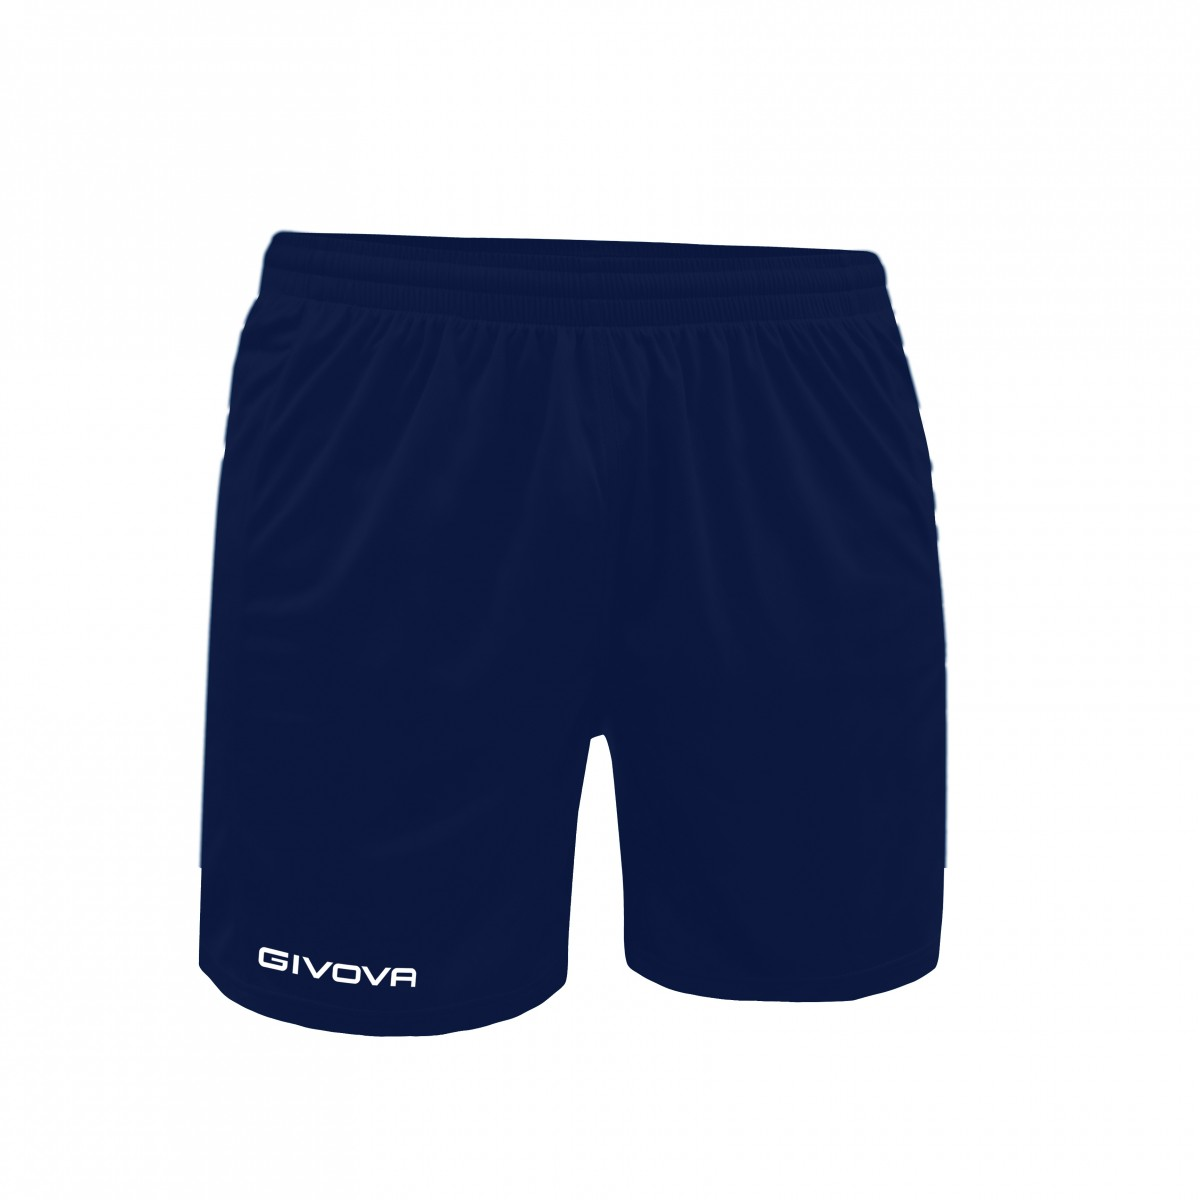 Givova One shorts blå